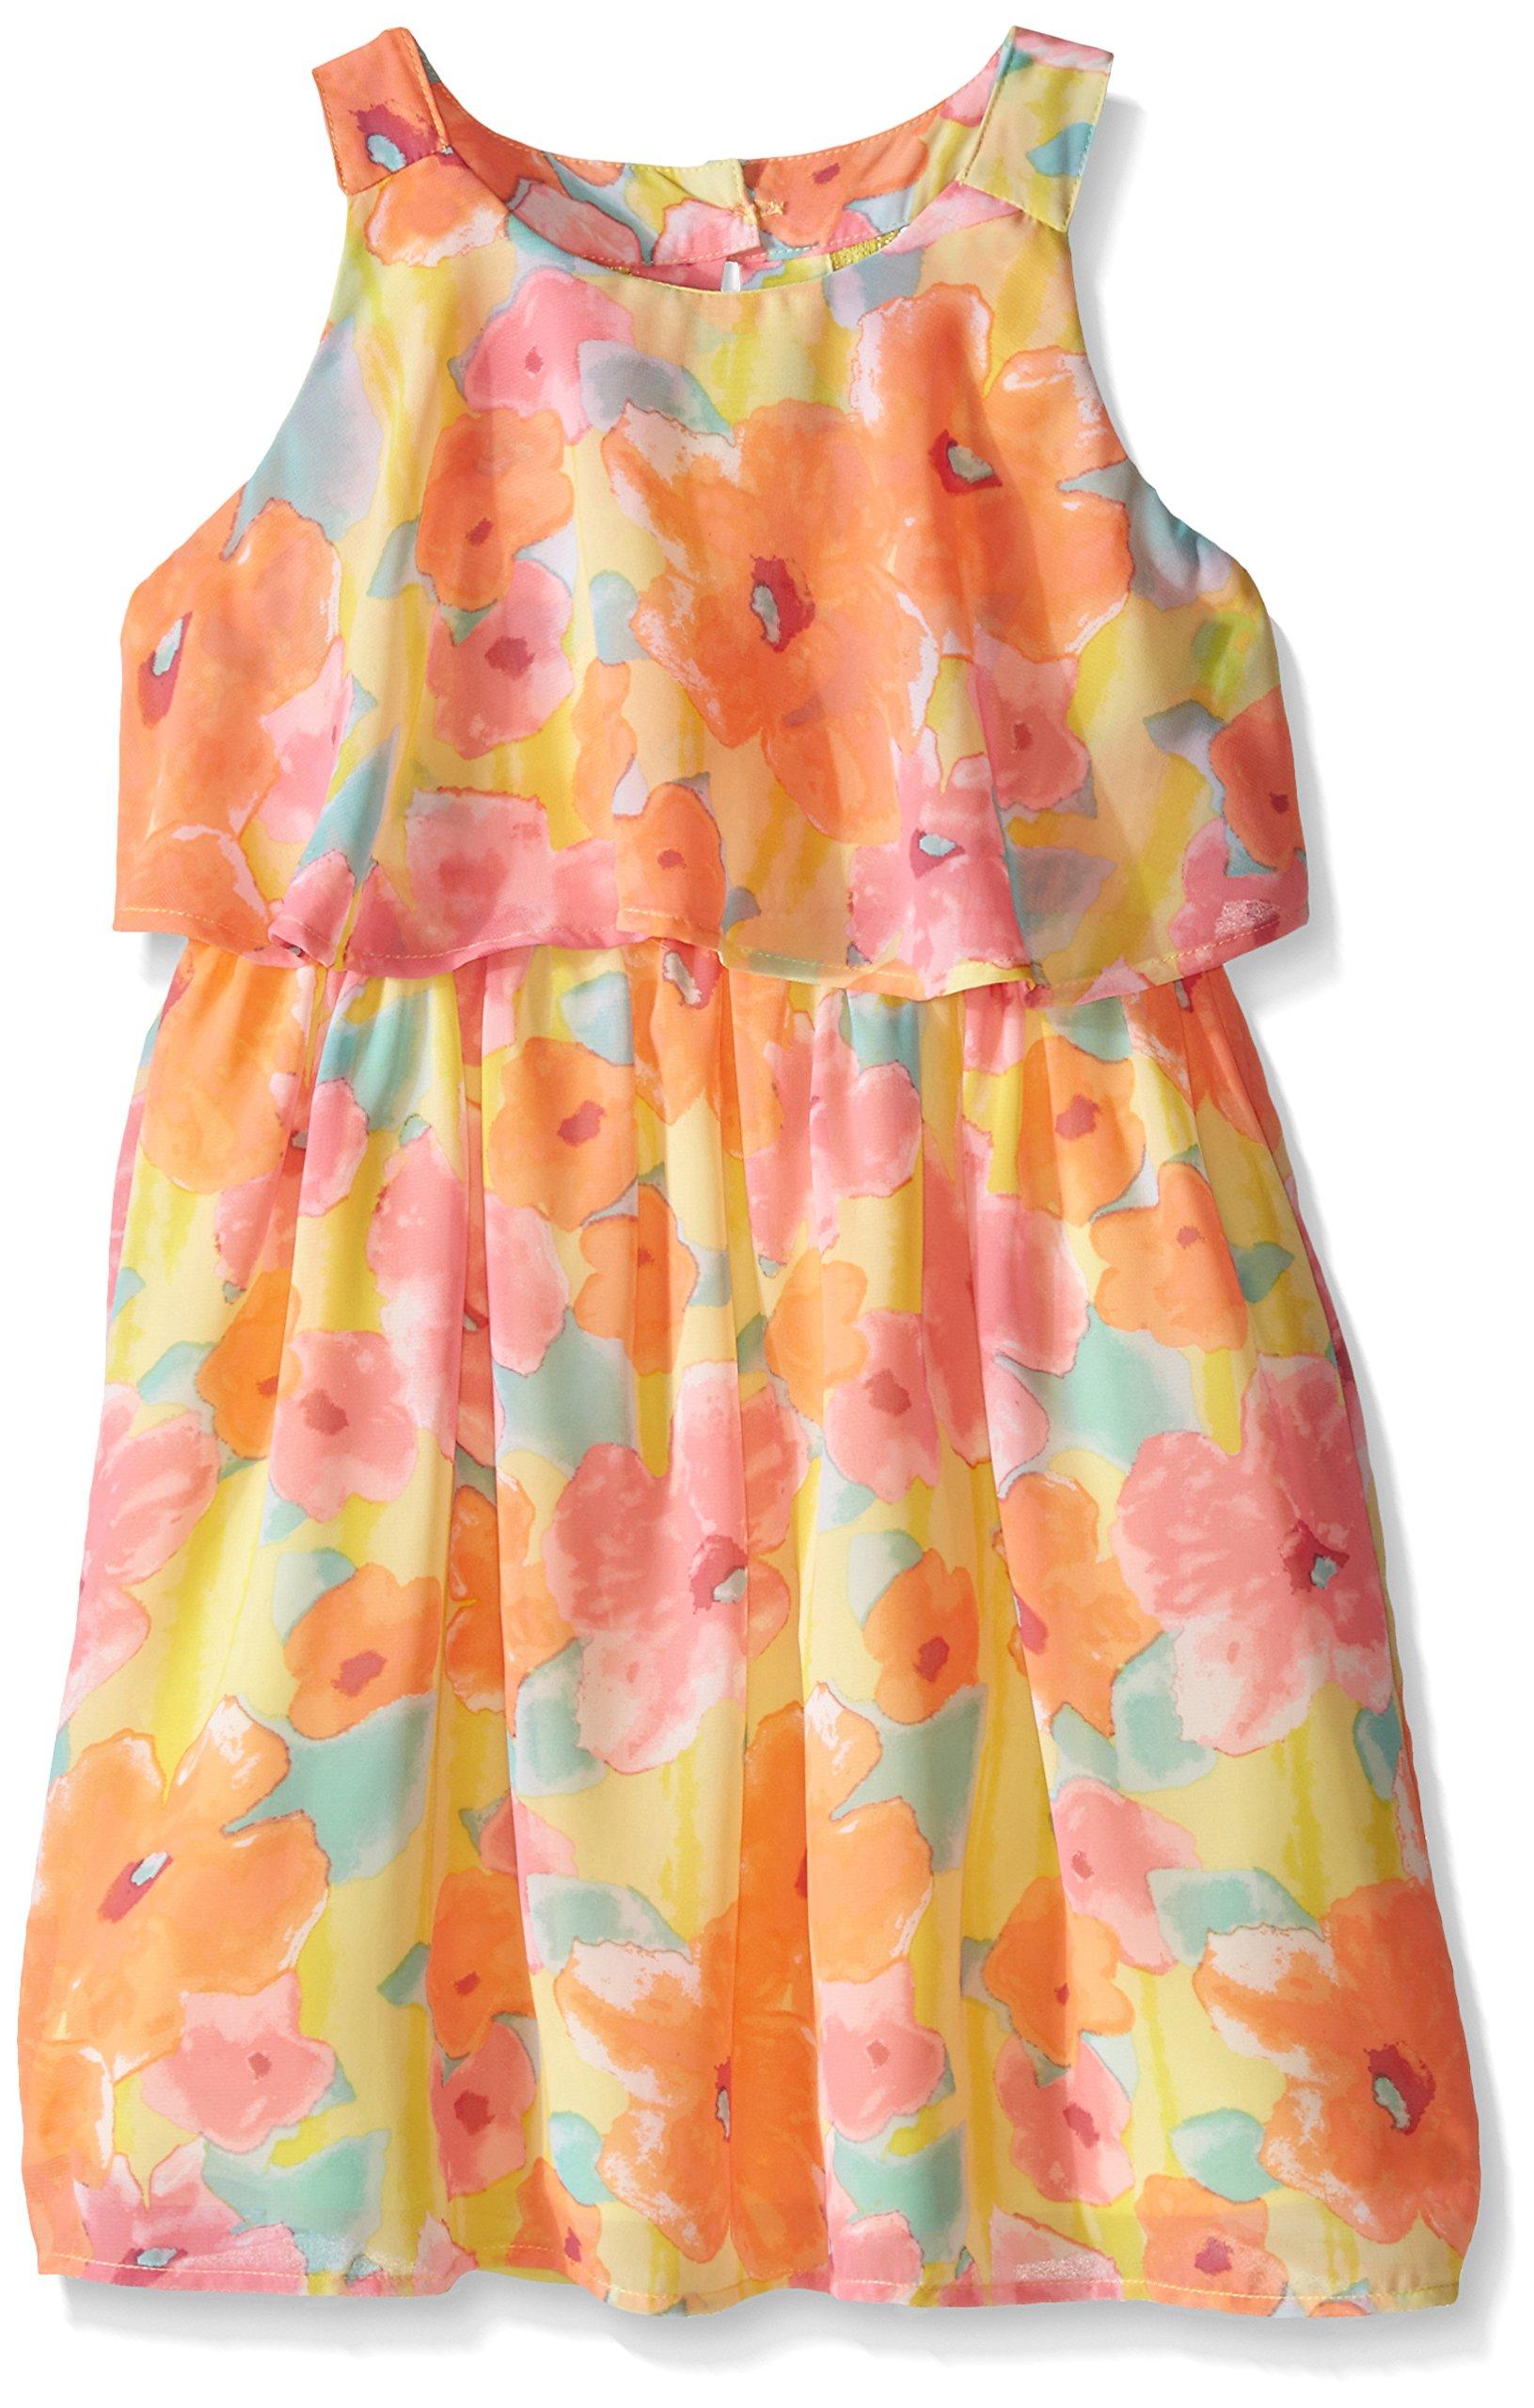 Pogo Club Big Girls Monet's Garden Chiffon Dress With Bag Vitamin C Large/14/16 by Pogo Club